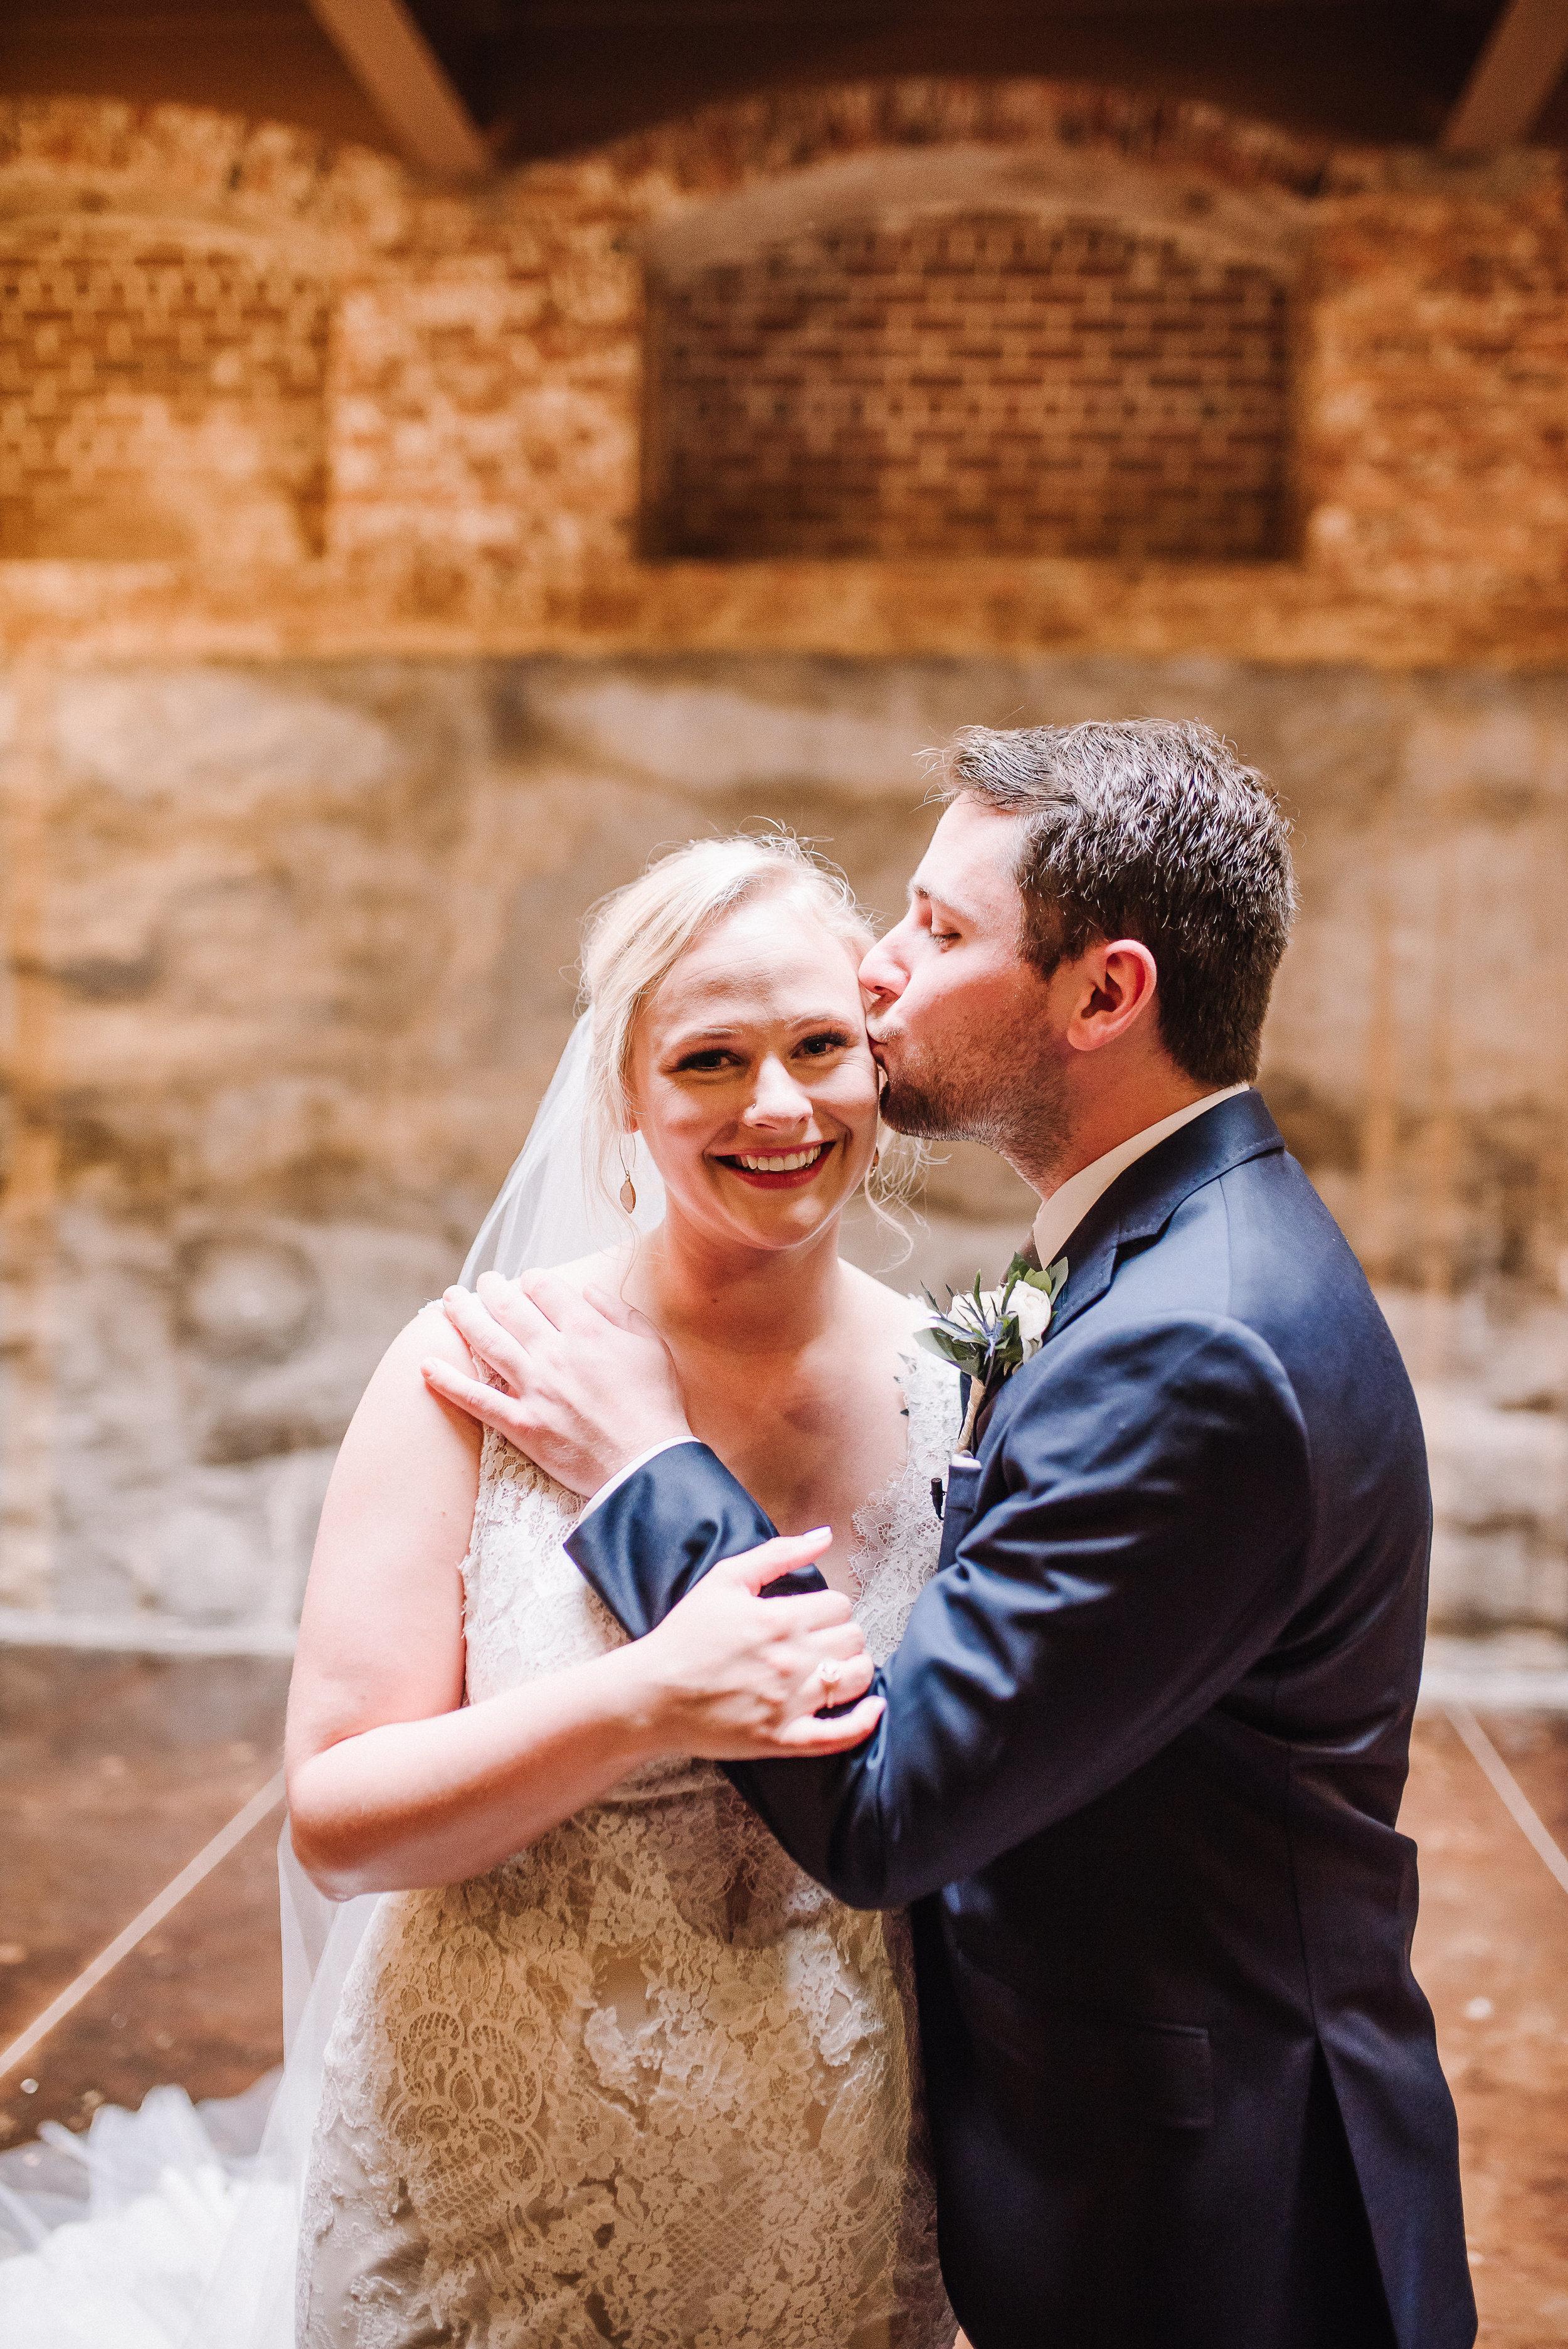 Morgan Wedding_Mill at Yellow River_Ashley Benham Photography-318.jpg